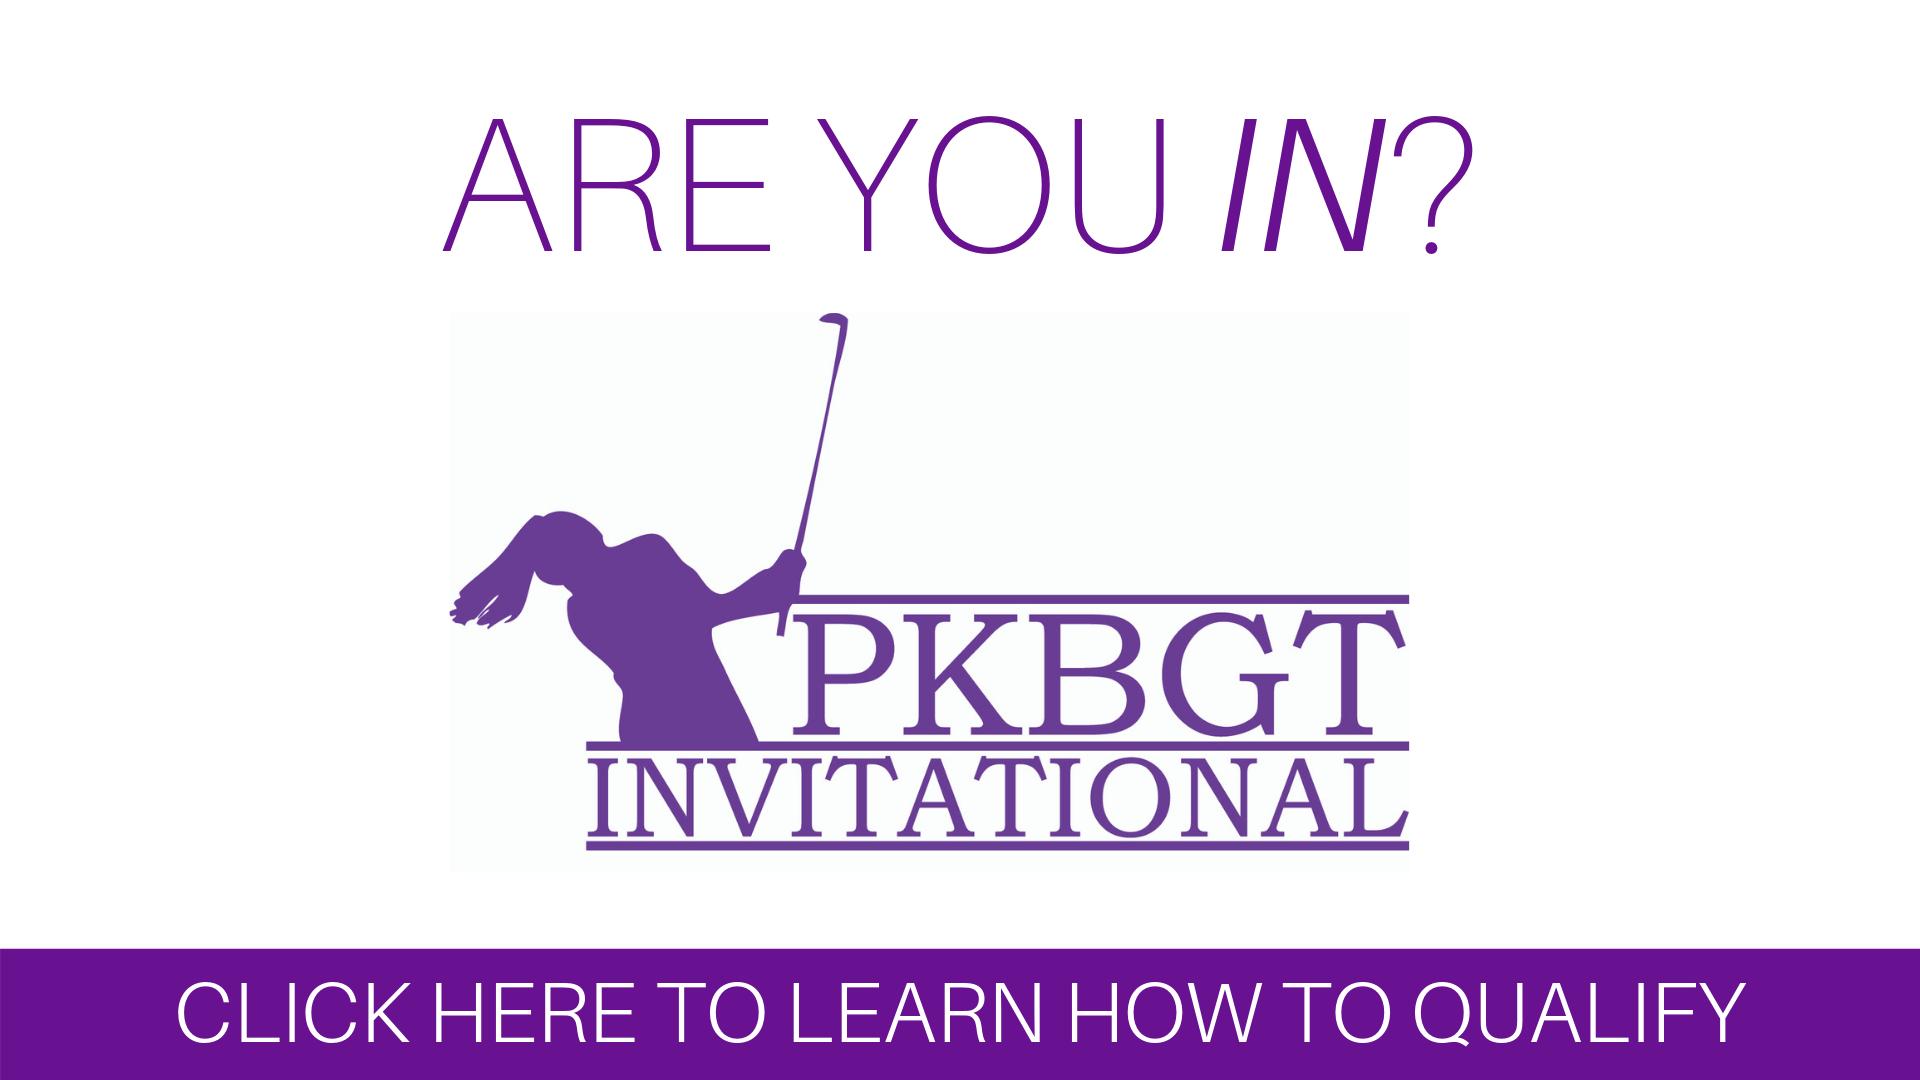 How to Qualify: 2019 PKBGT Invitational